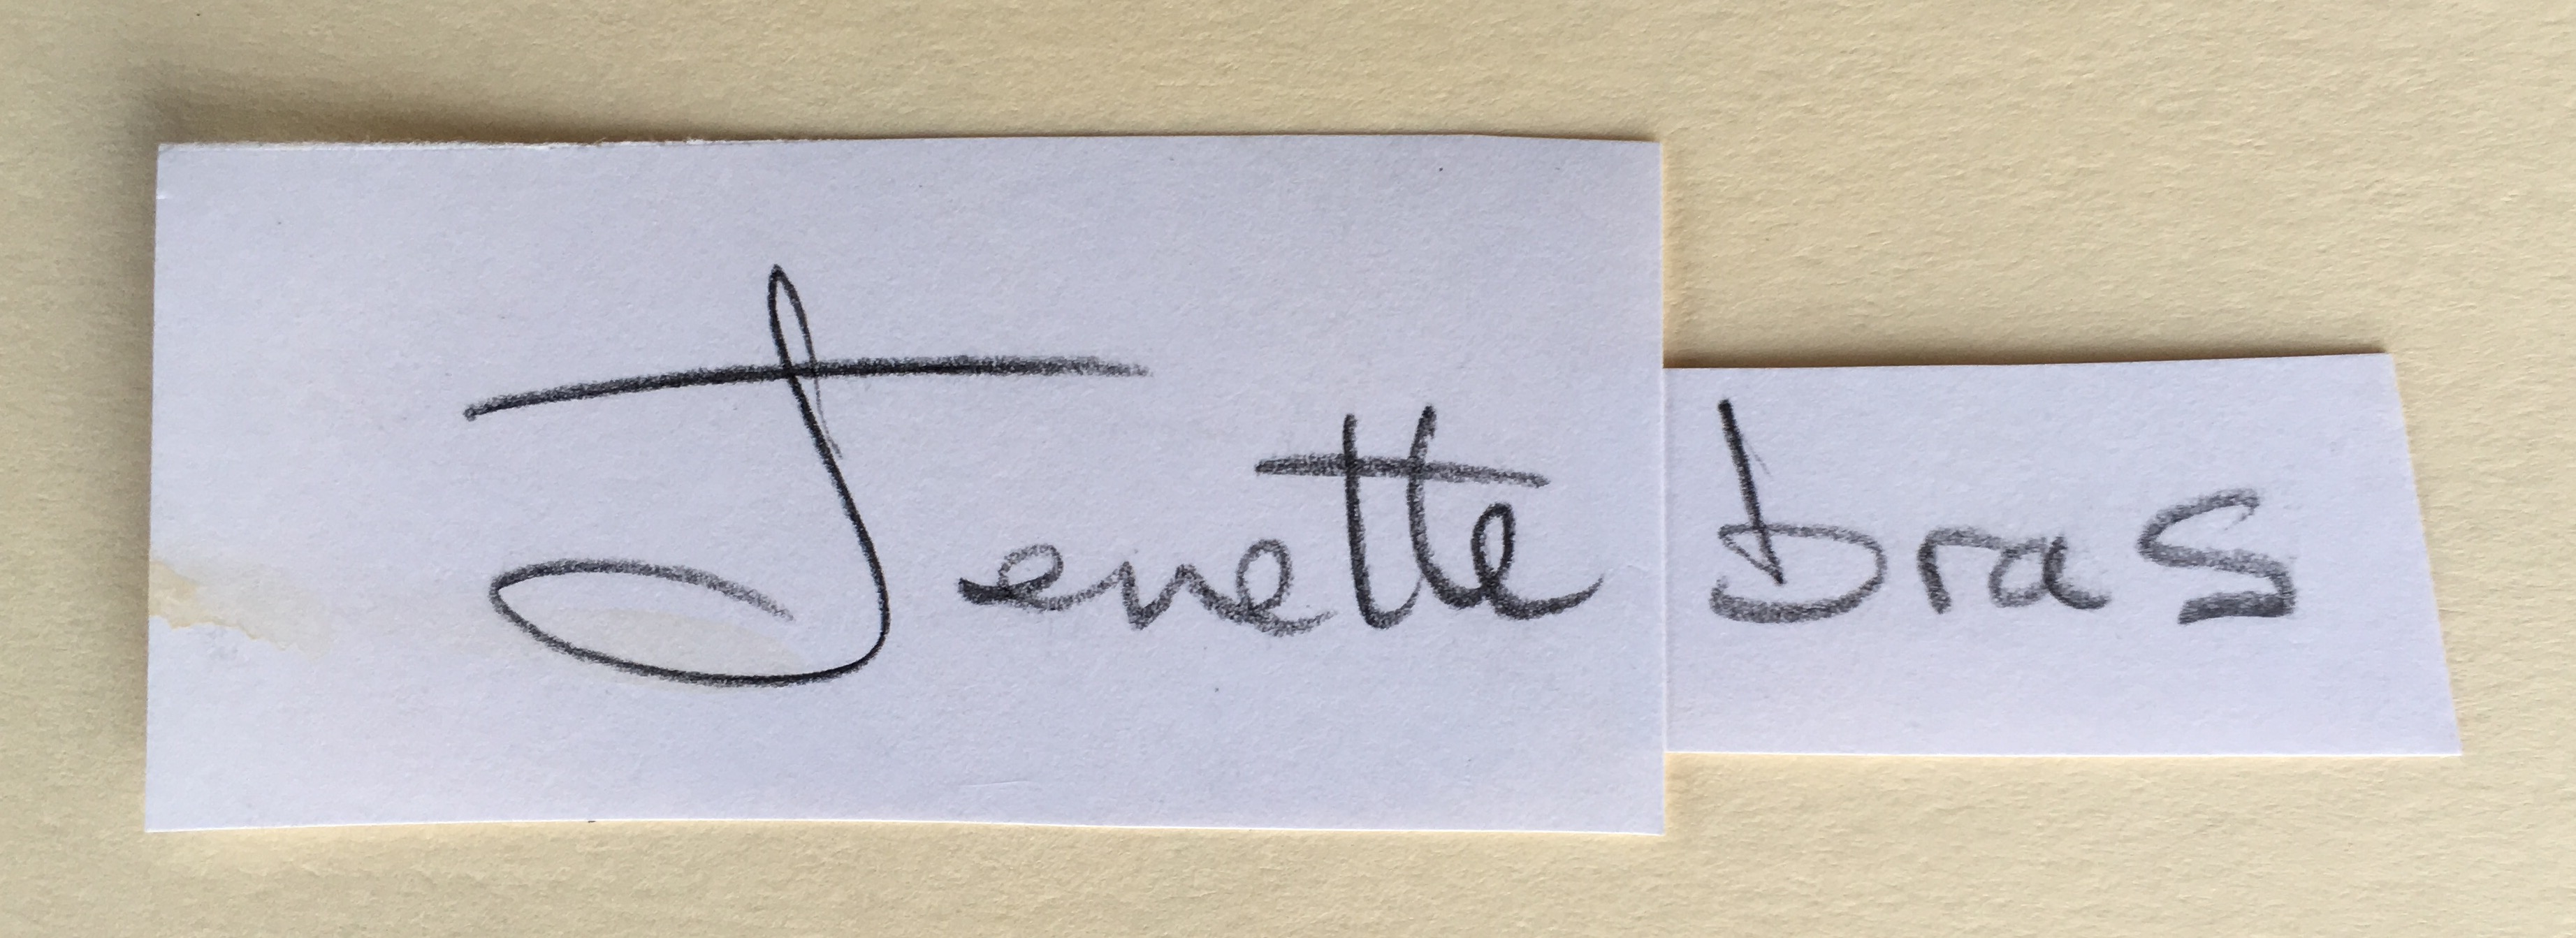 The Jenette Bras logo is based on Jenette's handwriting.